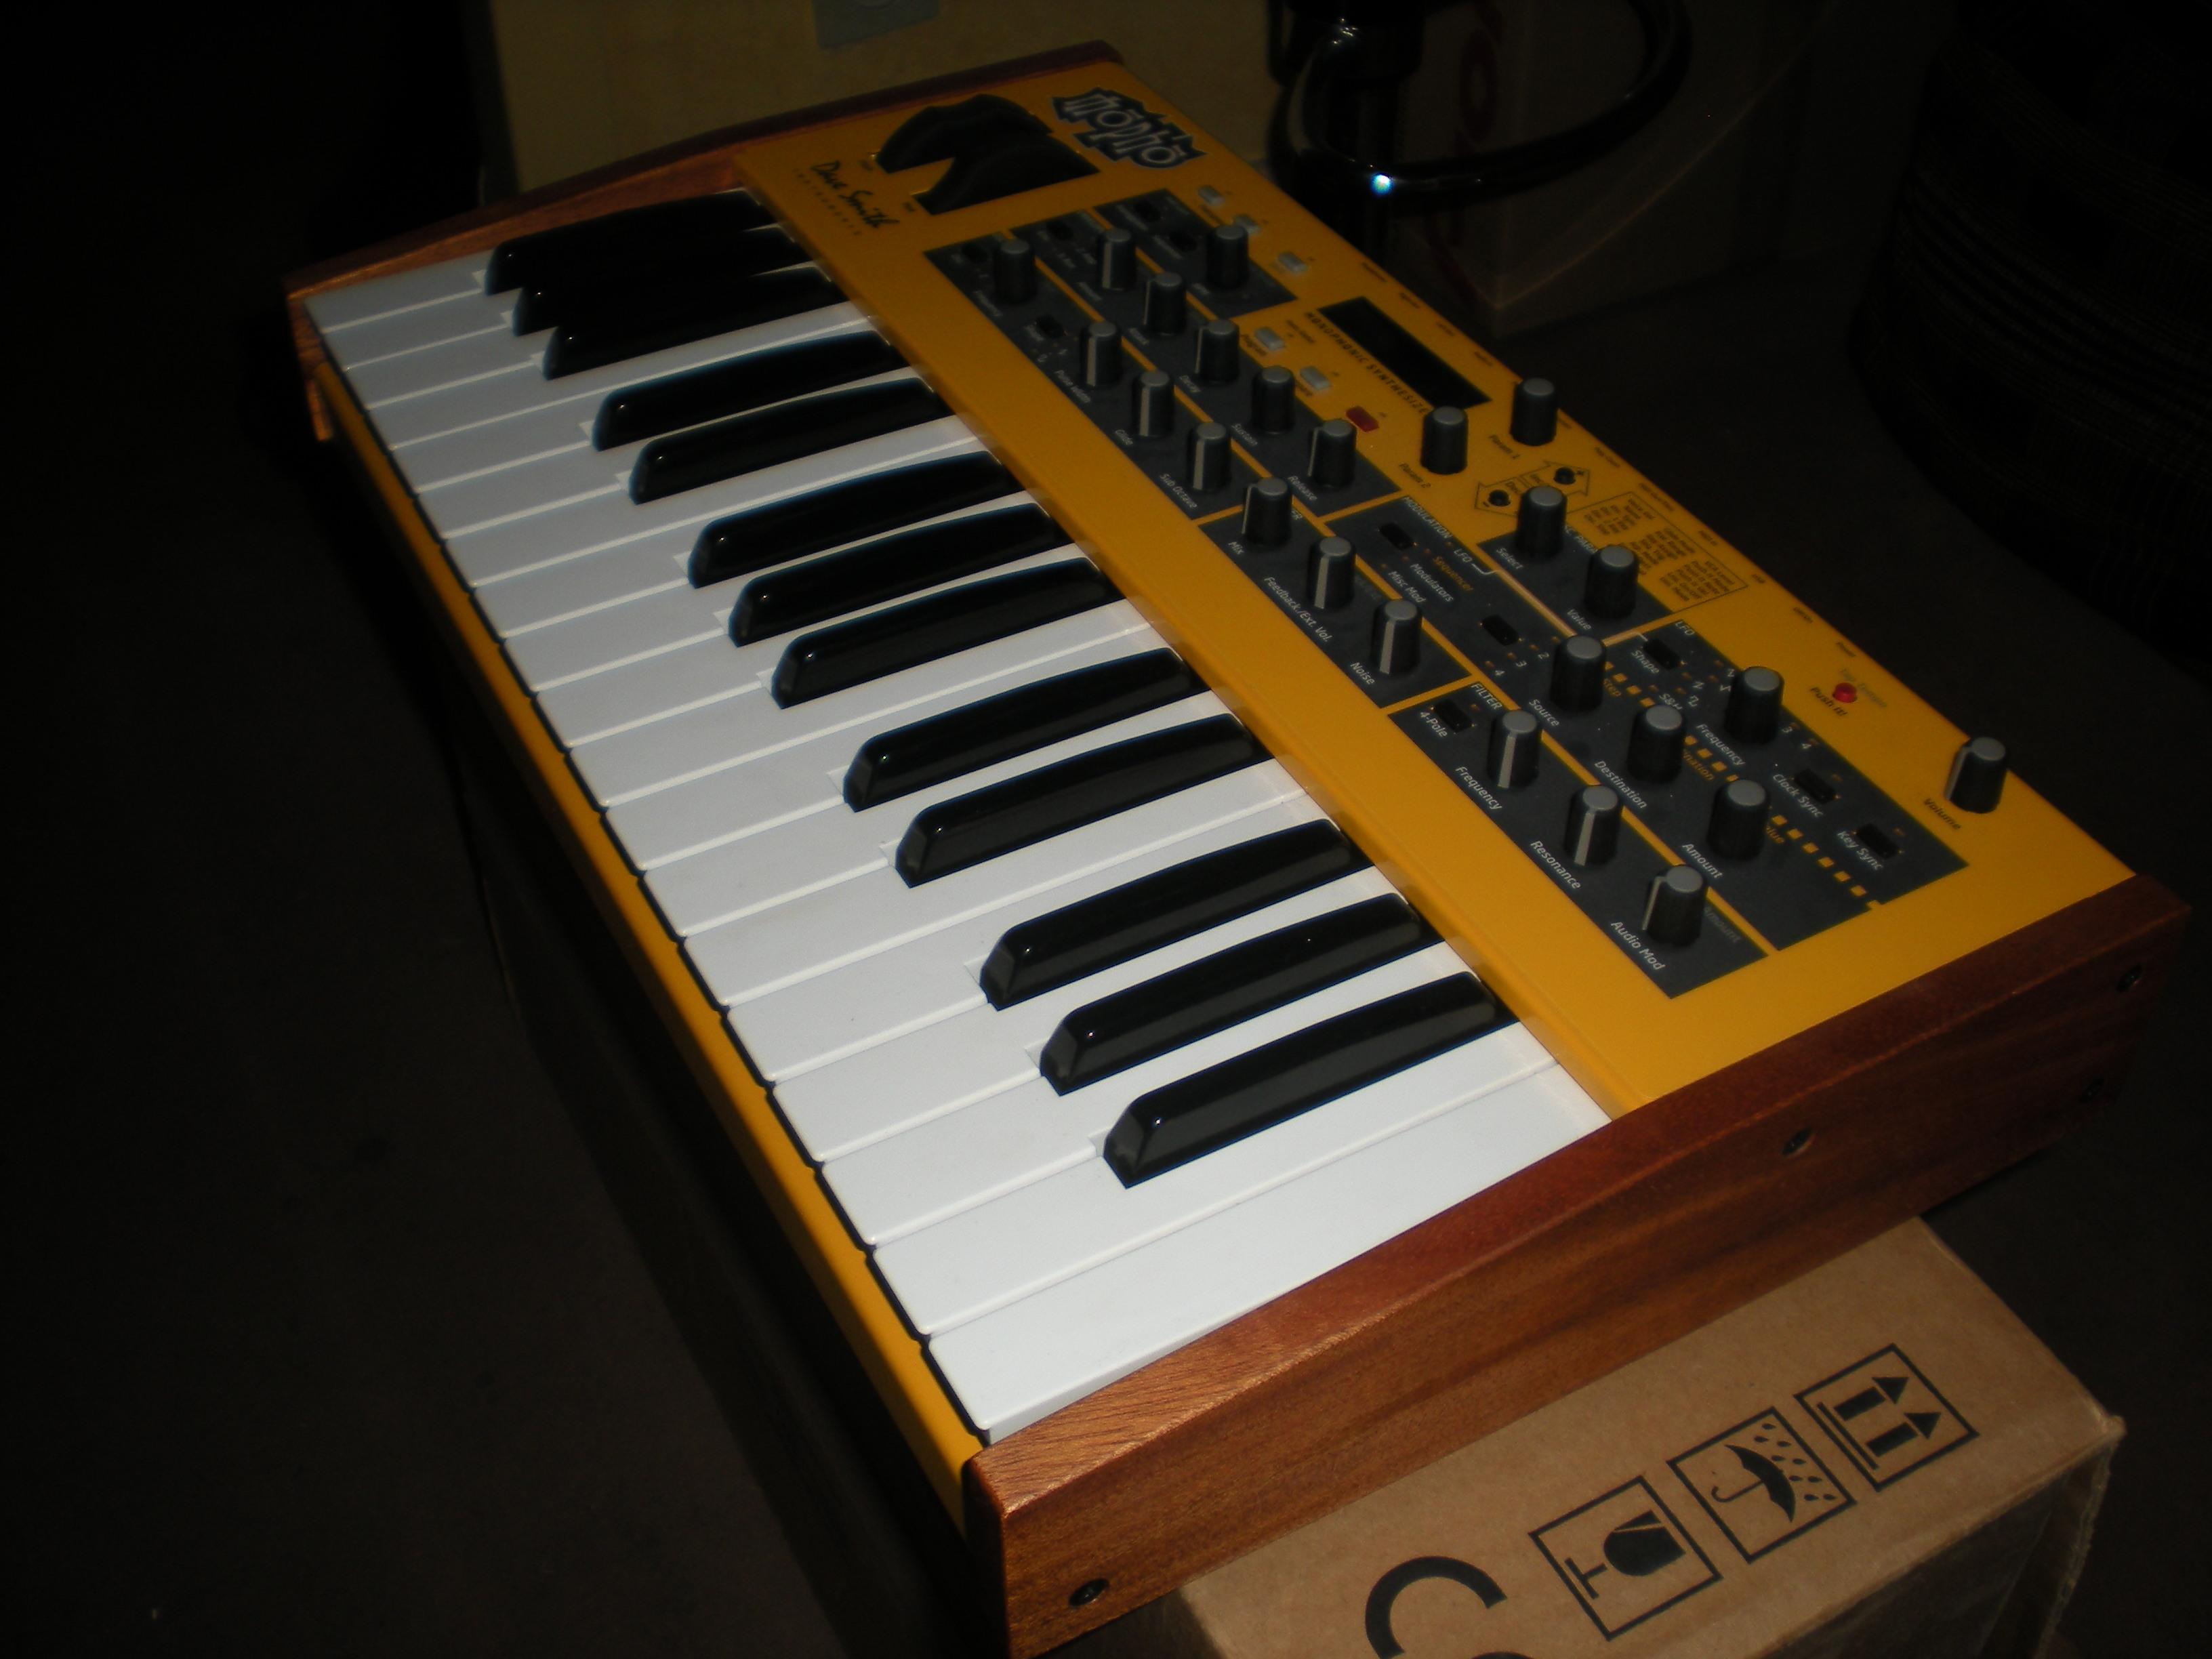 dave smith instruments mopho keyboard image 249319 audiofanzine. Black Bedroom Furniture Sets. Home Design Ideas